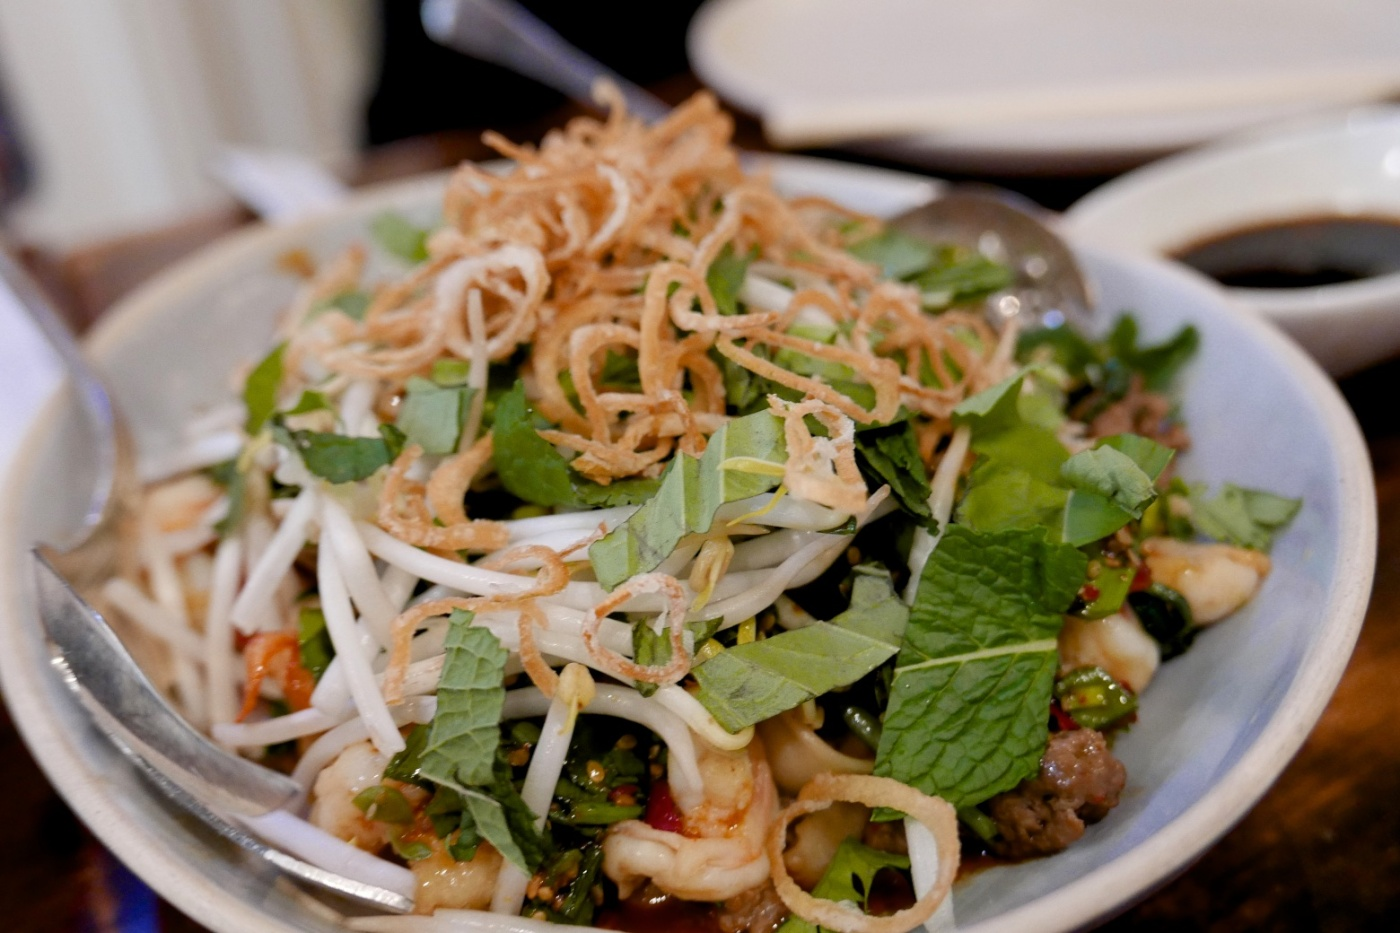 Goat and Shrimp Slap Noodles, Chicken Chow Fun